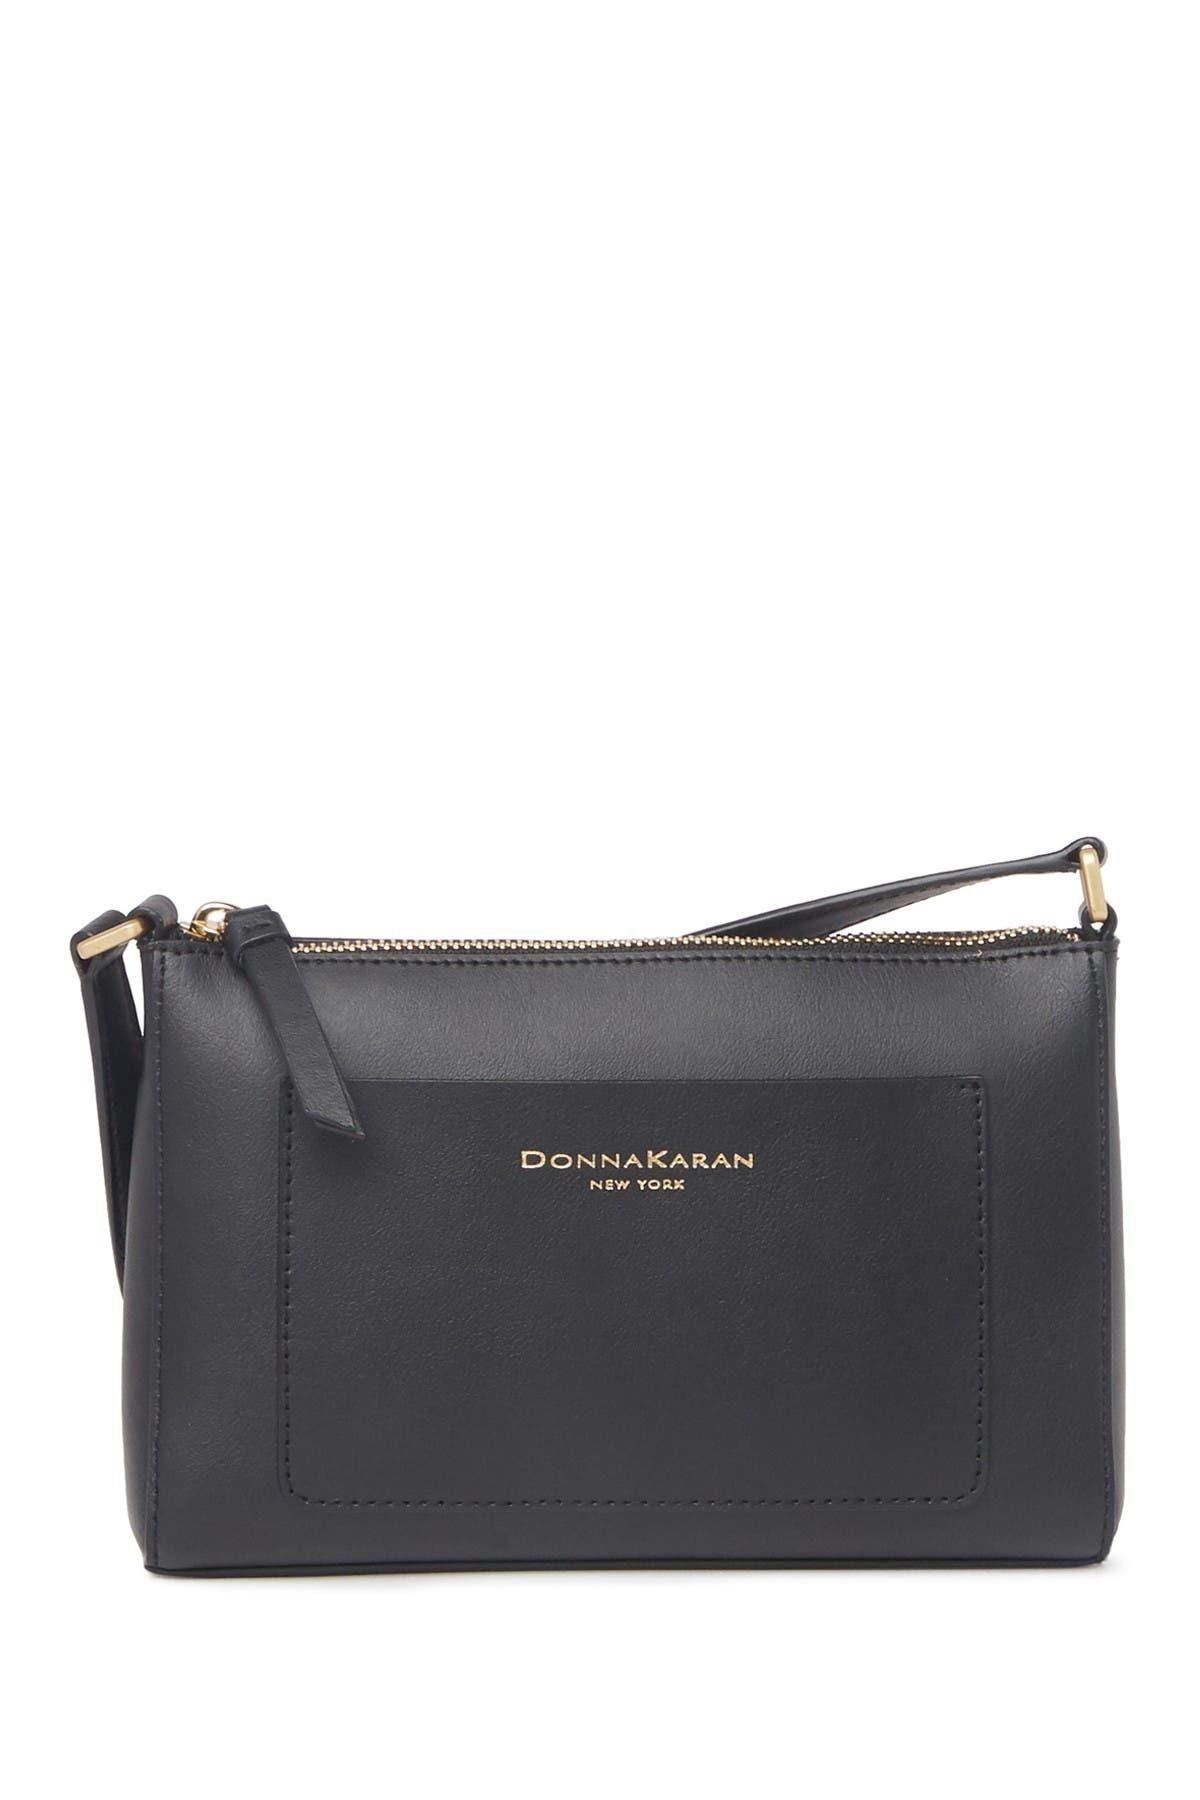 Image of Donna Karan Karla Small Leather Crossbody Bag